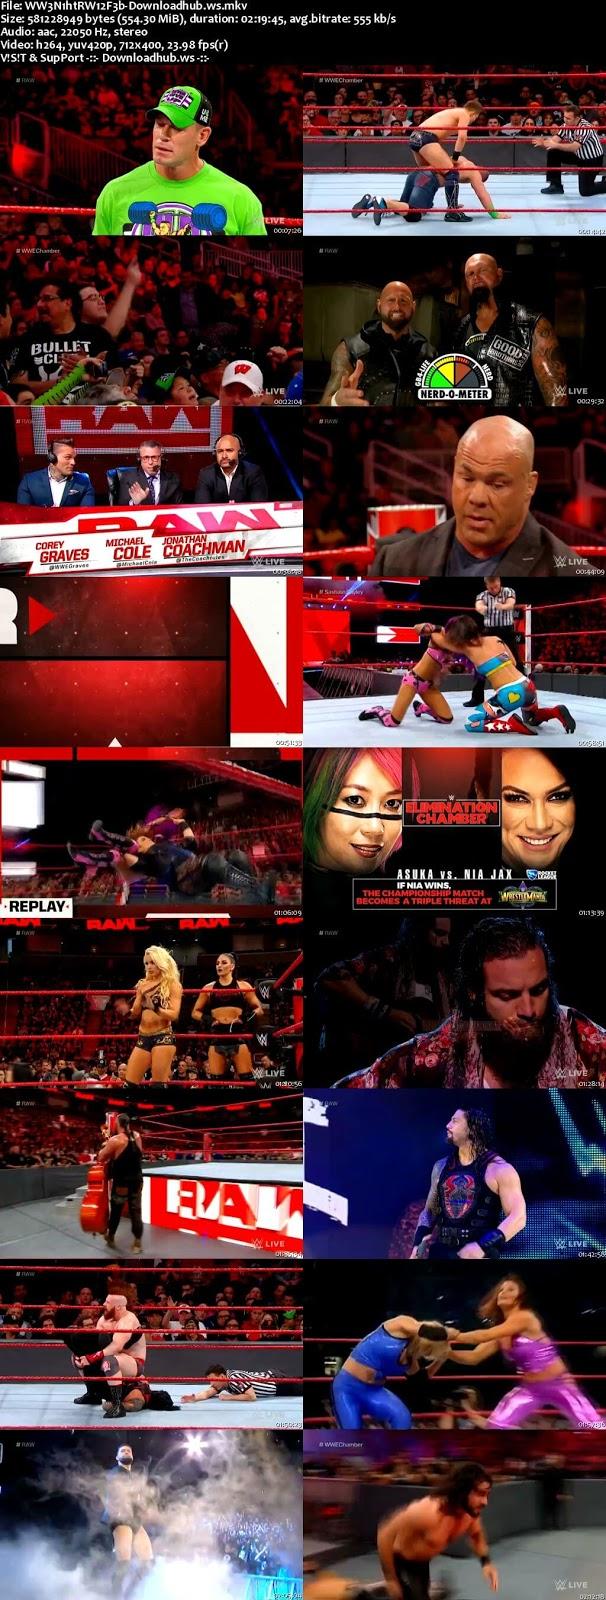 WWE Monday Night Raw 12 February 2018 480p HDTV Download